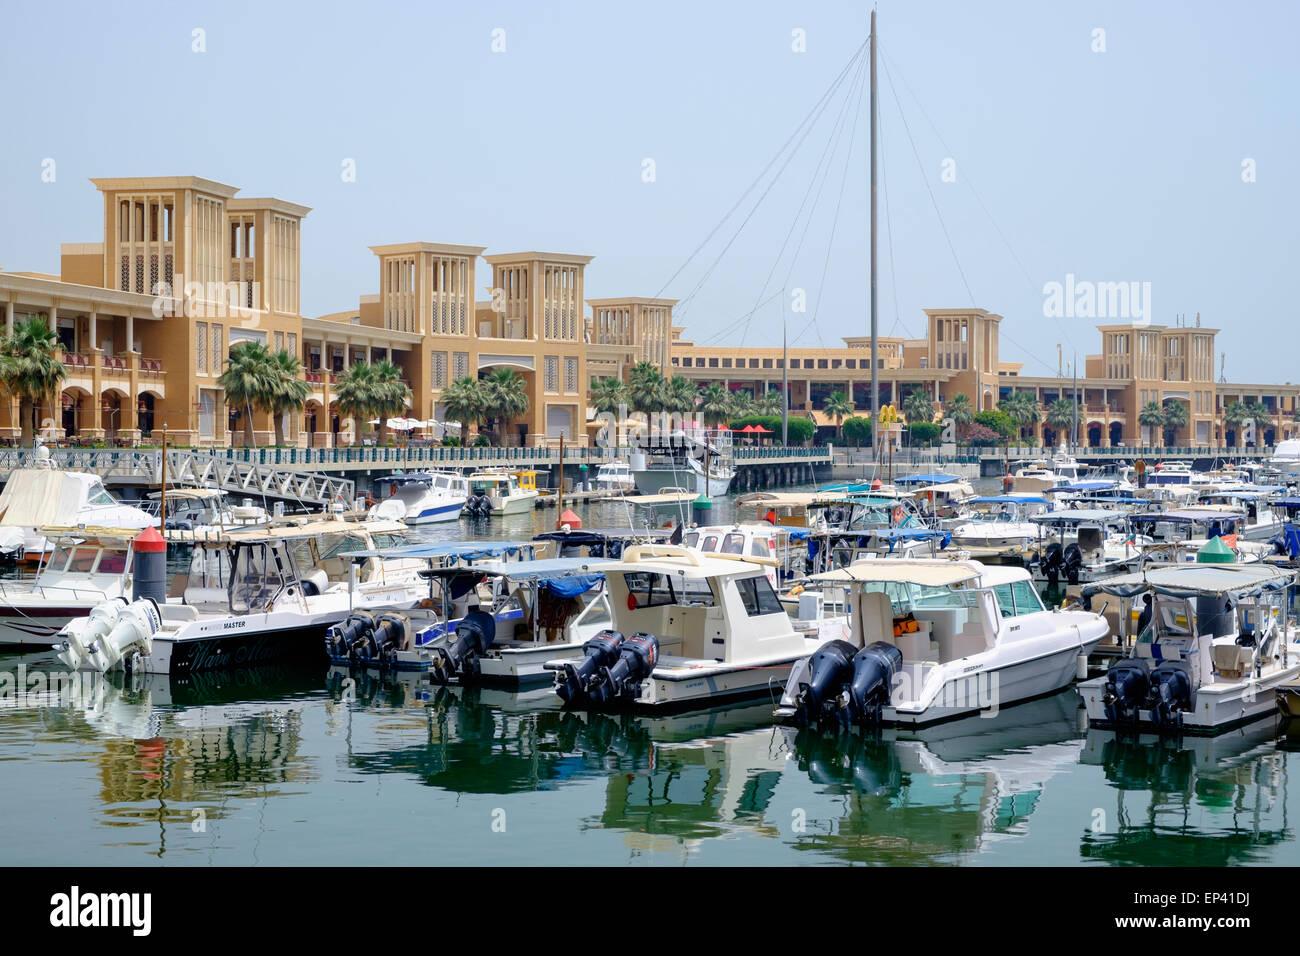 Souq Sharq shopping mall and marina in Kuwait City Kuwait - Stock Image